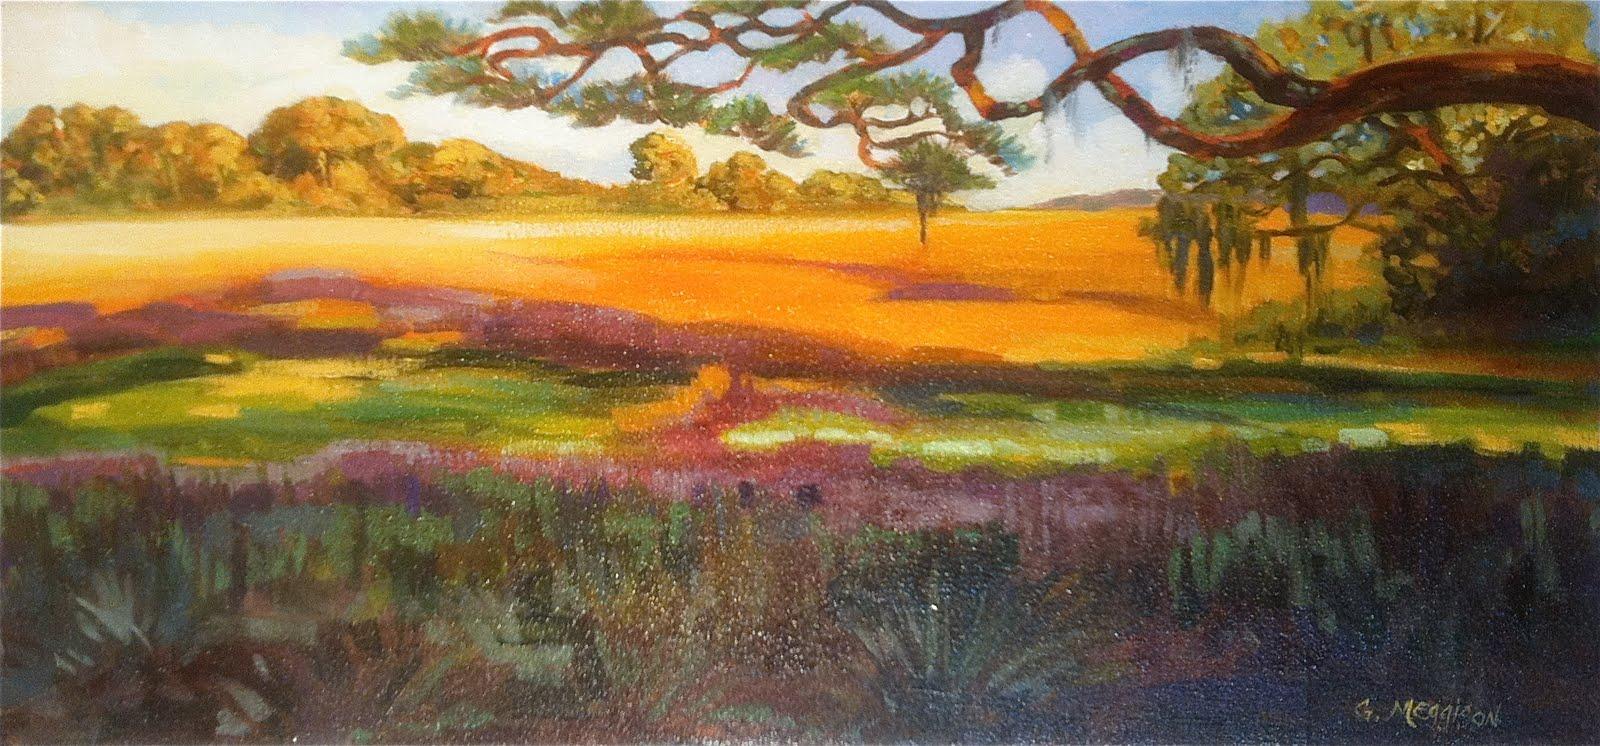 Gordon Meggison Winter Watercolor And Oil Schedule